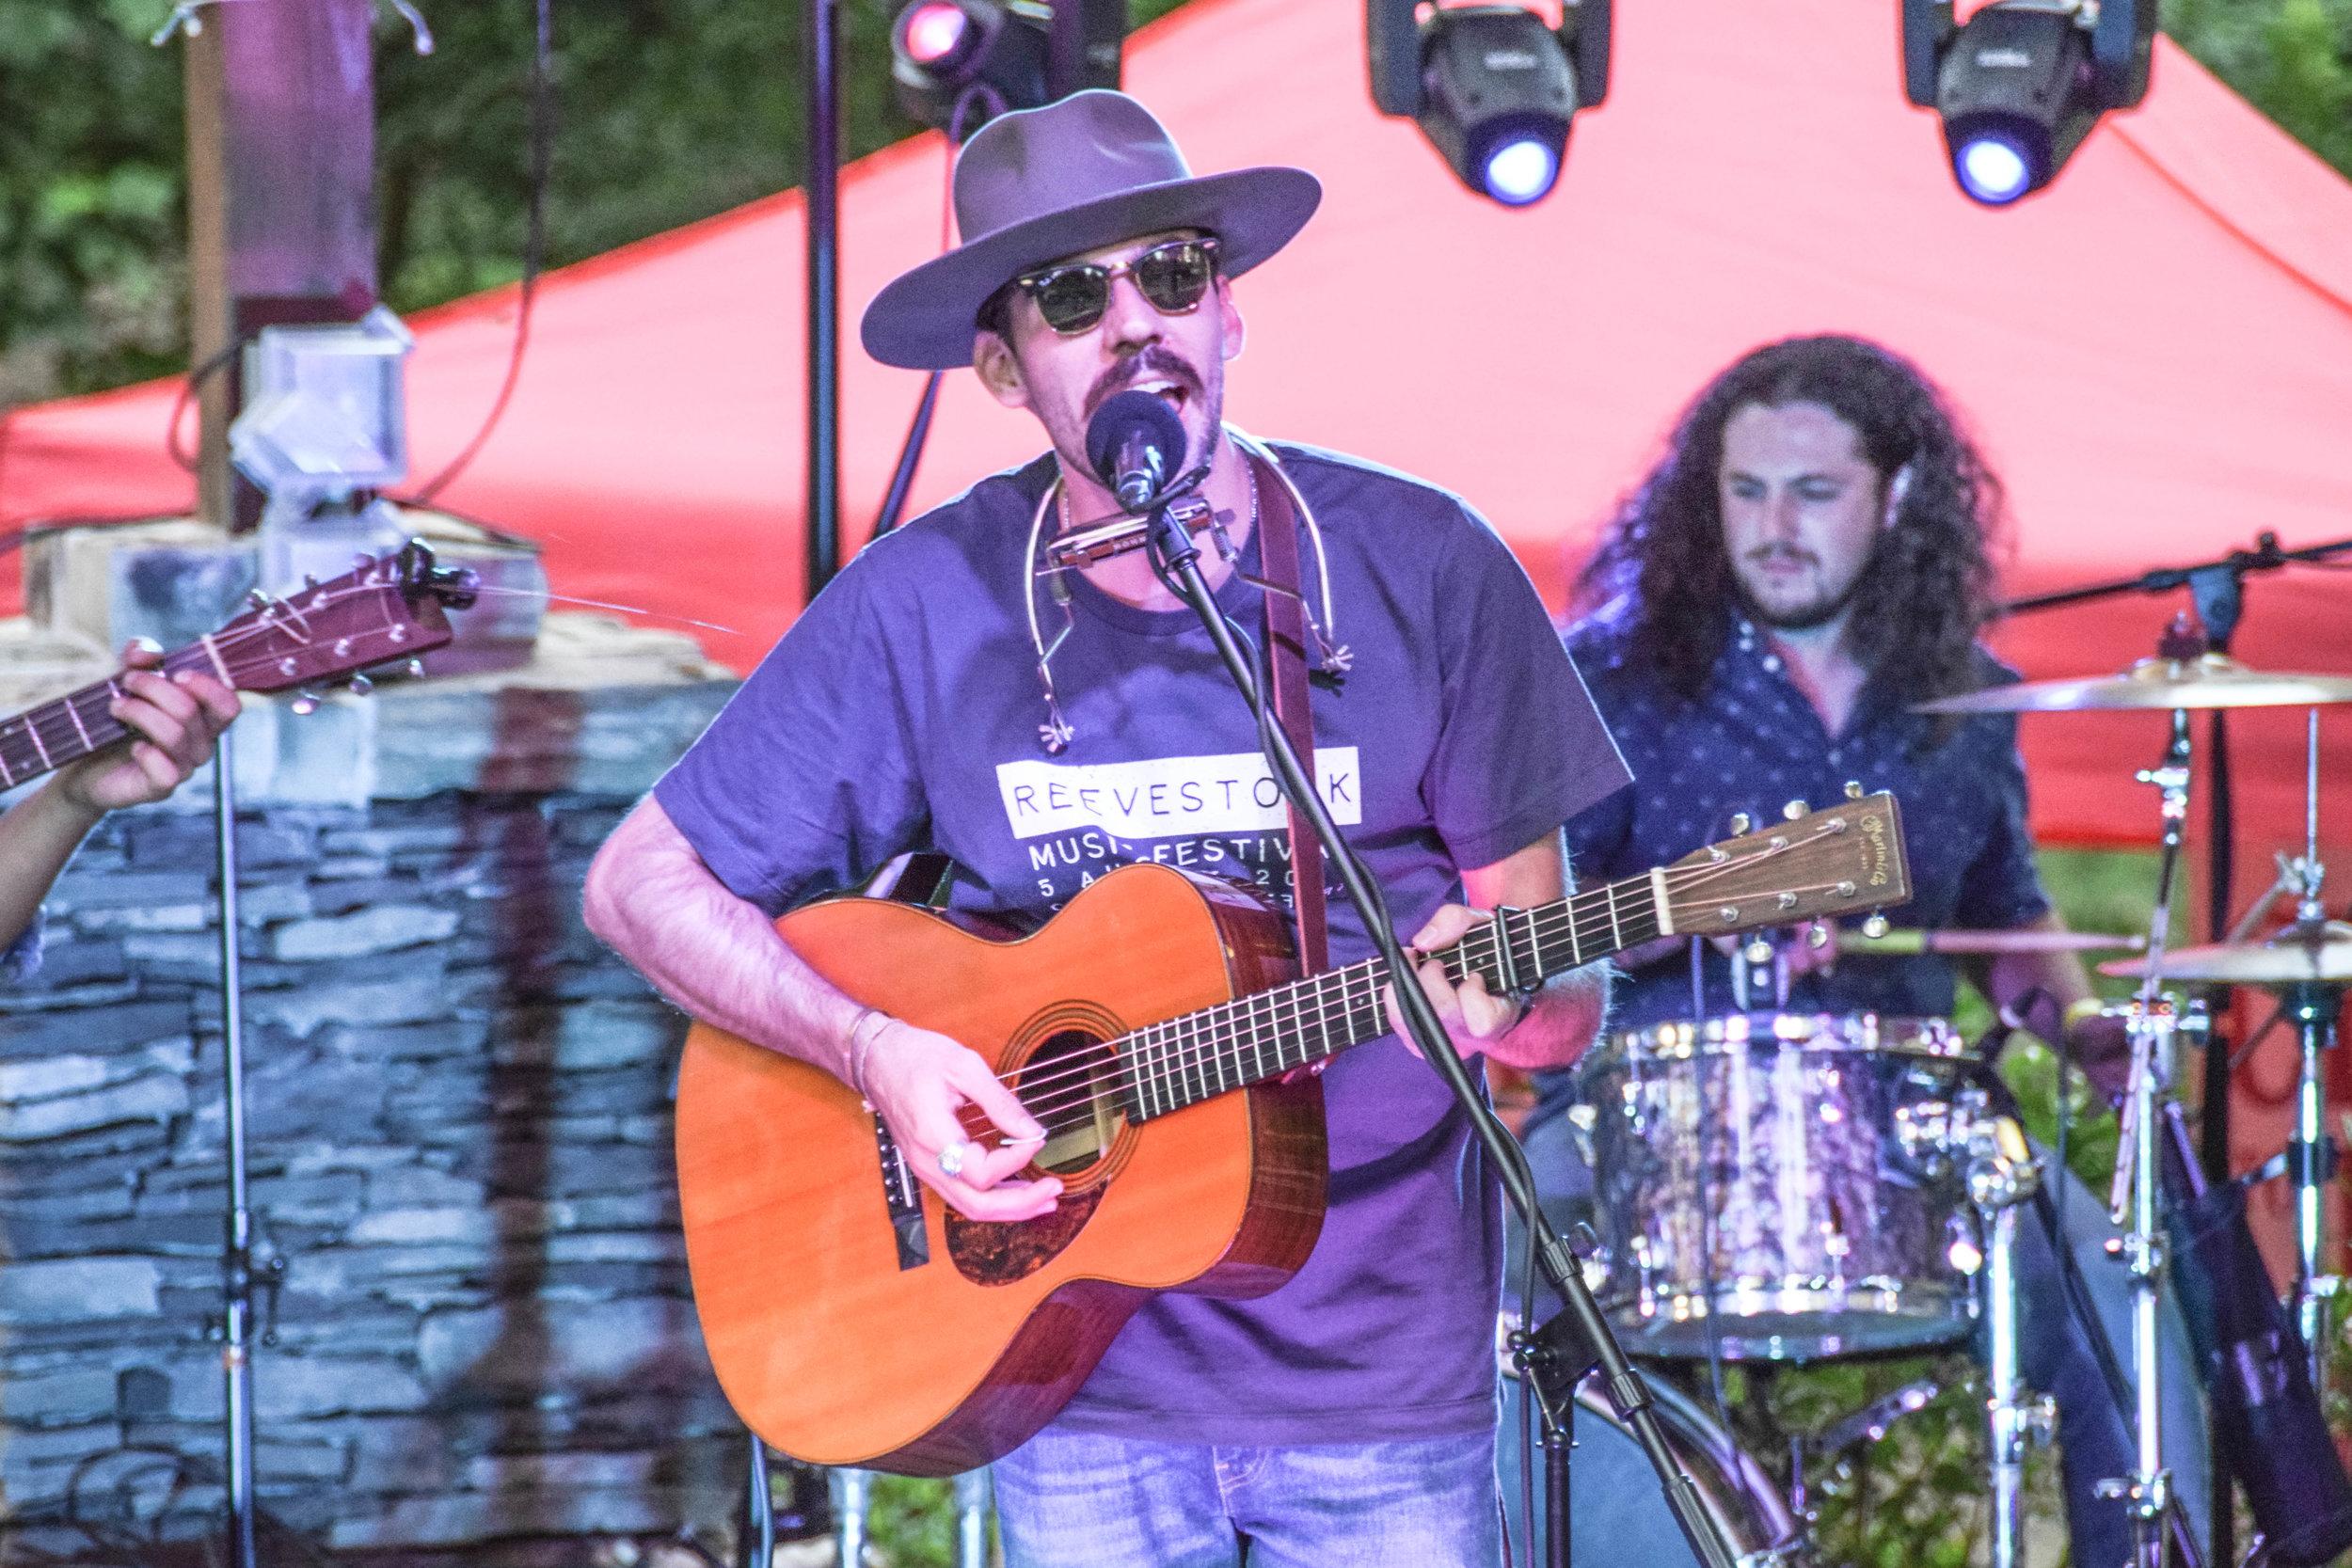 time-sawyer-reevestock-music-festival-2017-elkin-north-carolina_36266636631_o.jpg